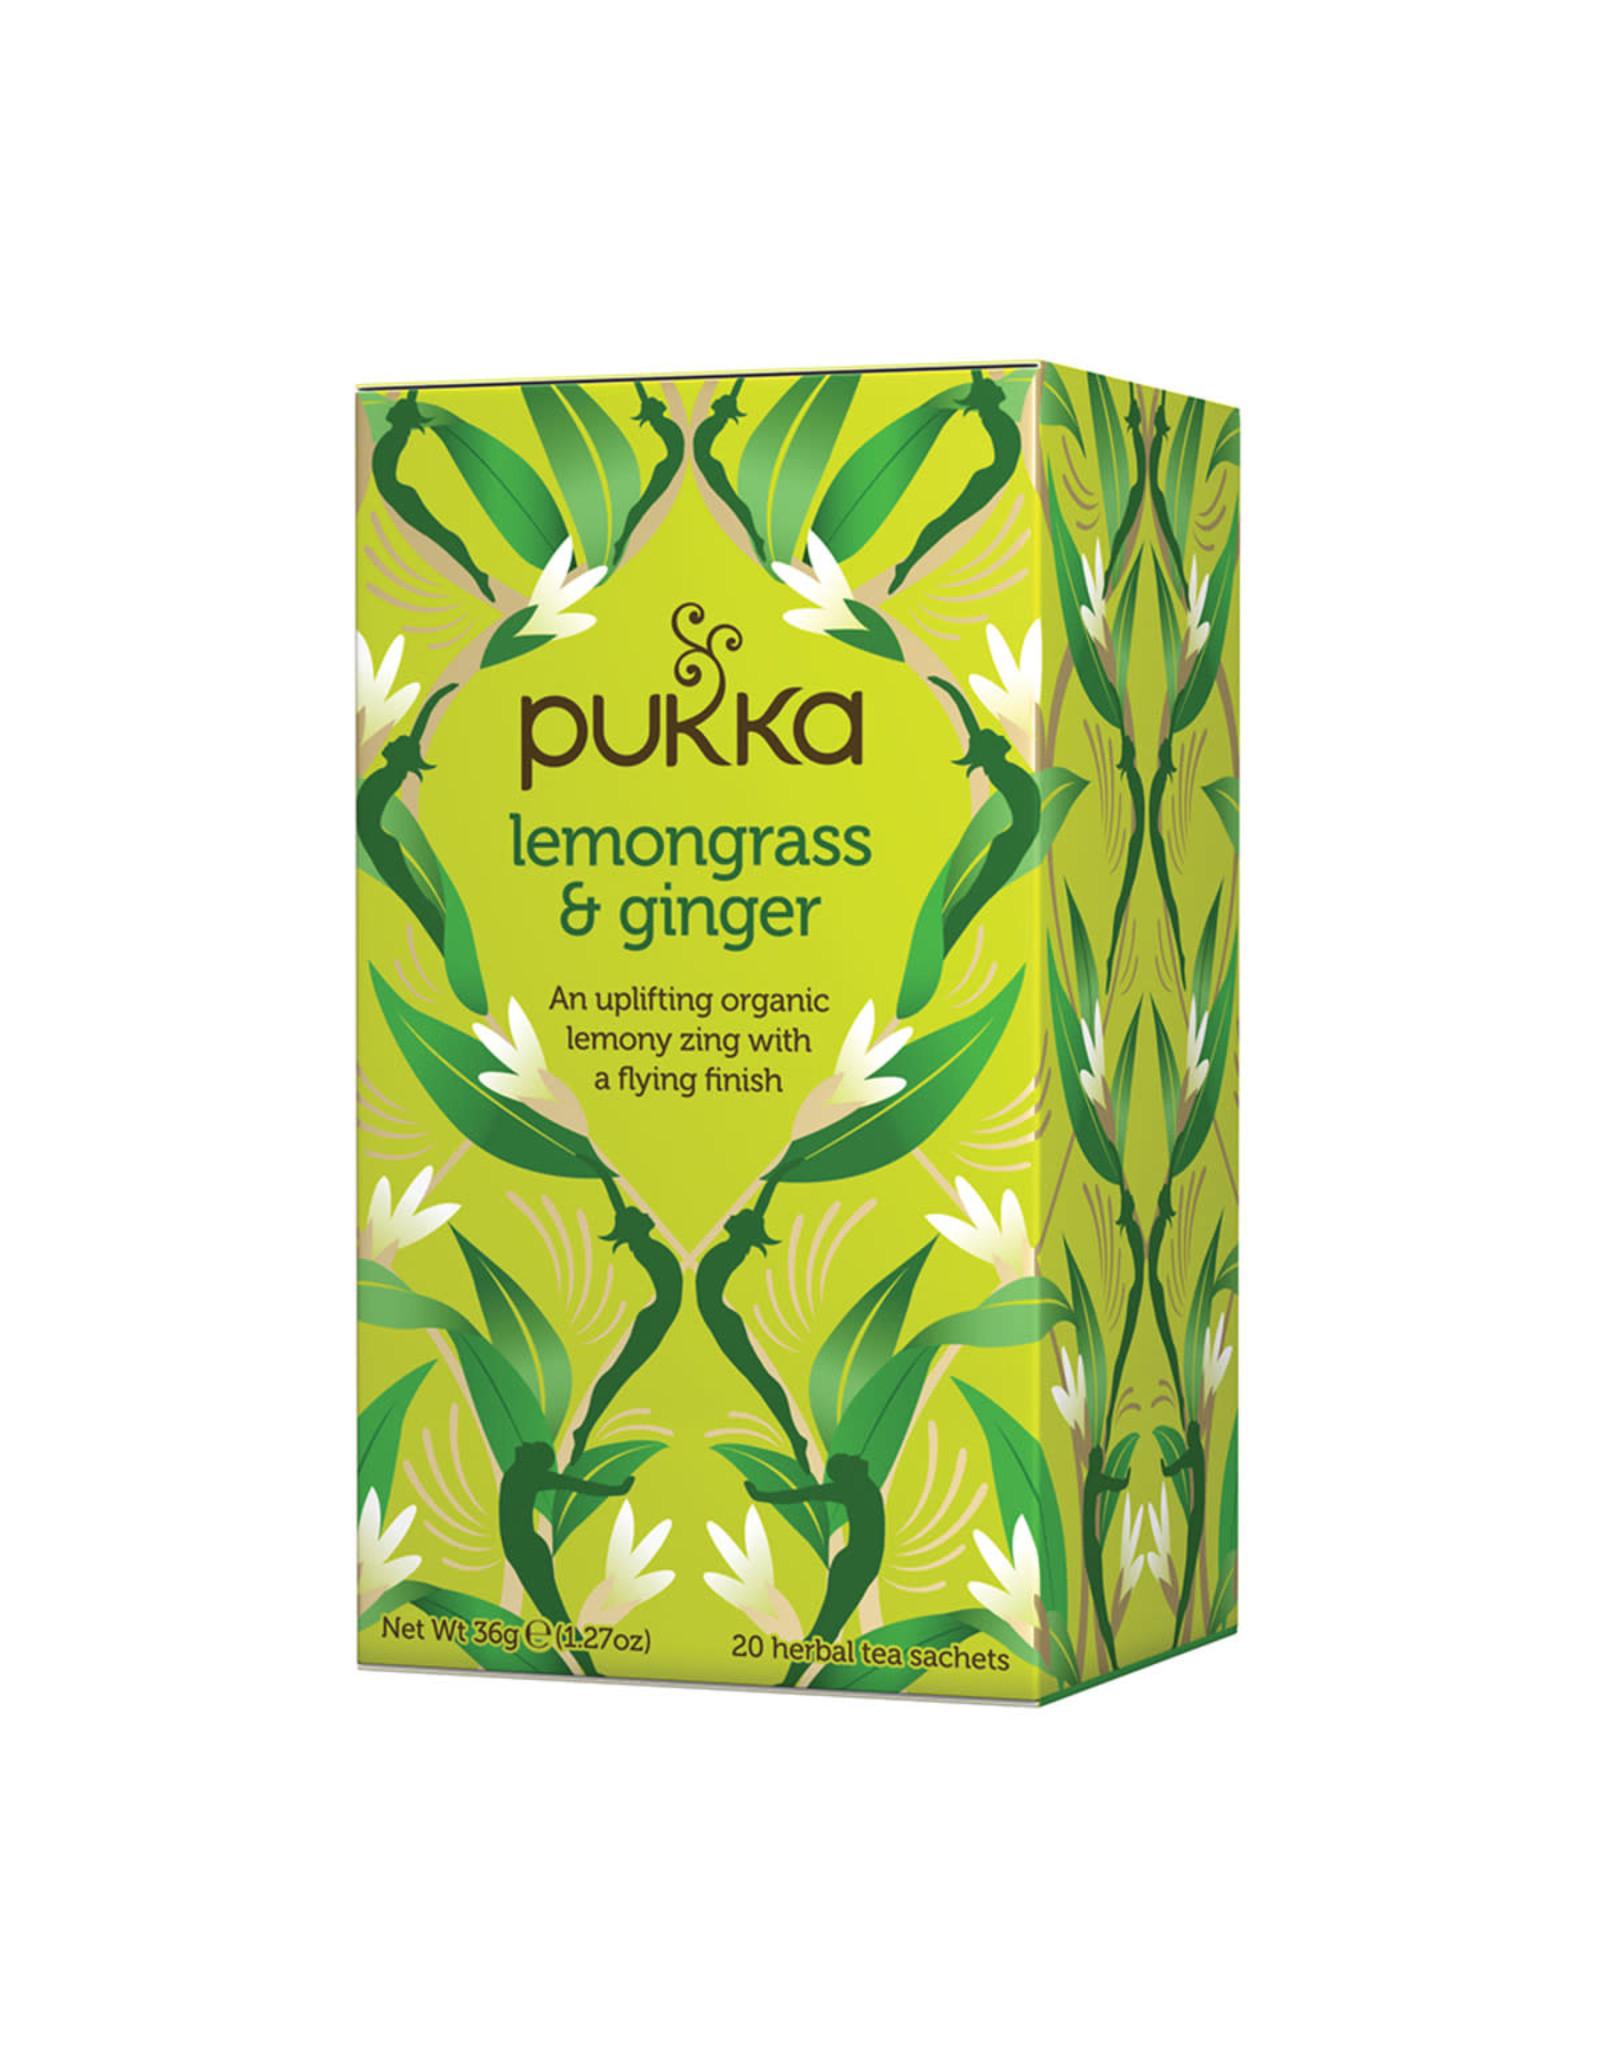 Pukka Lemongrass & Ginger x 20 Tea Bags